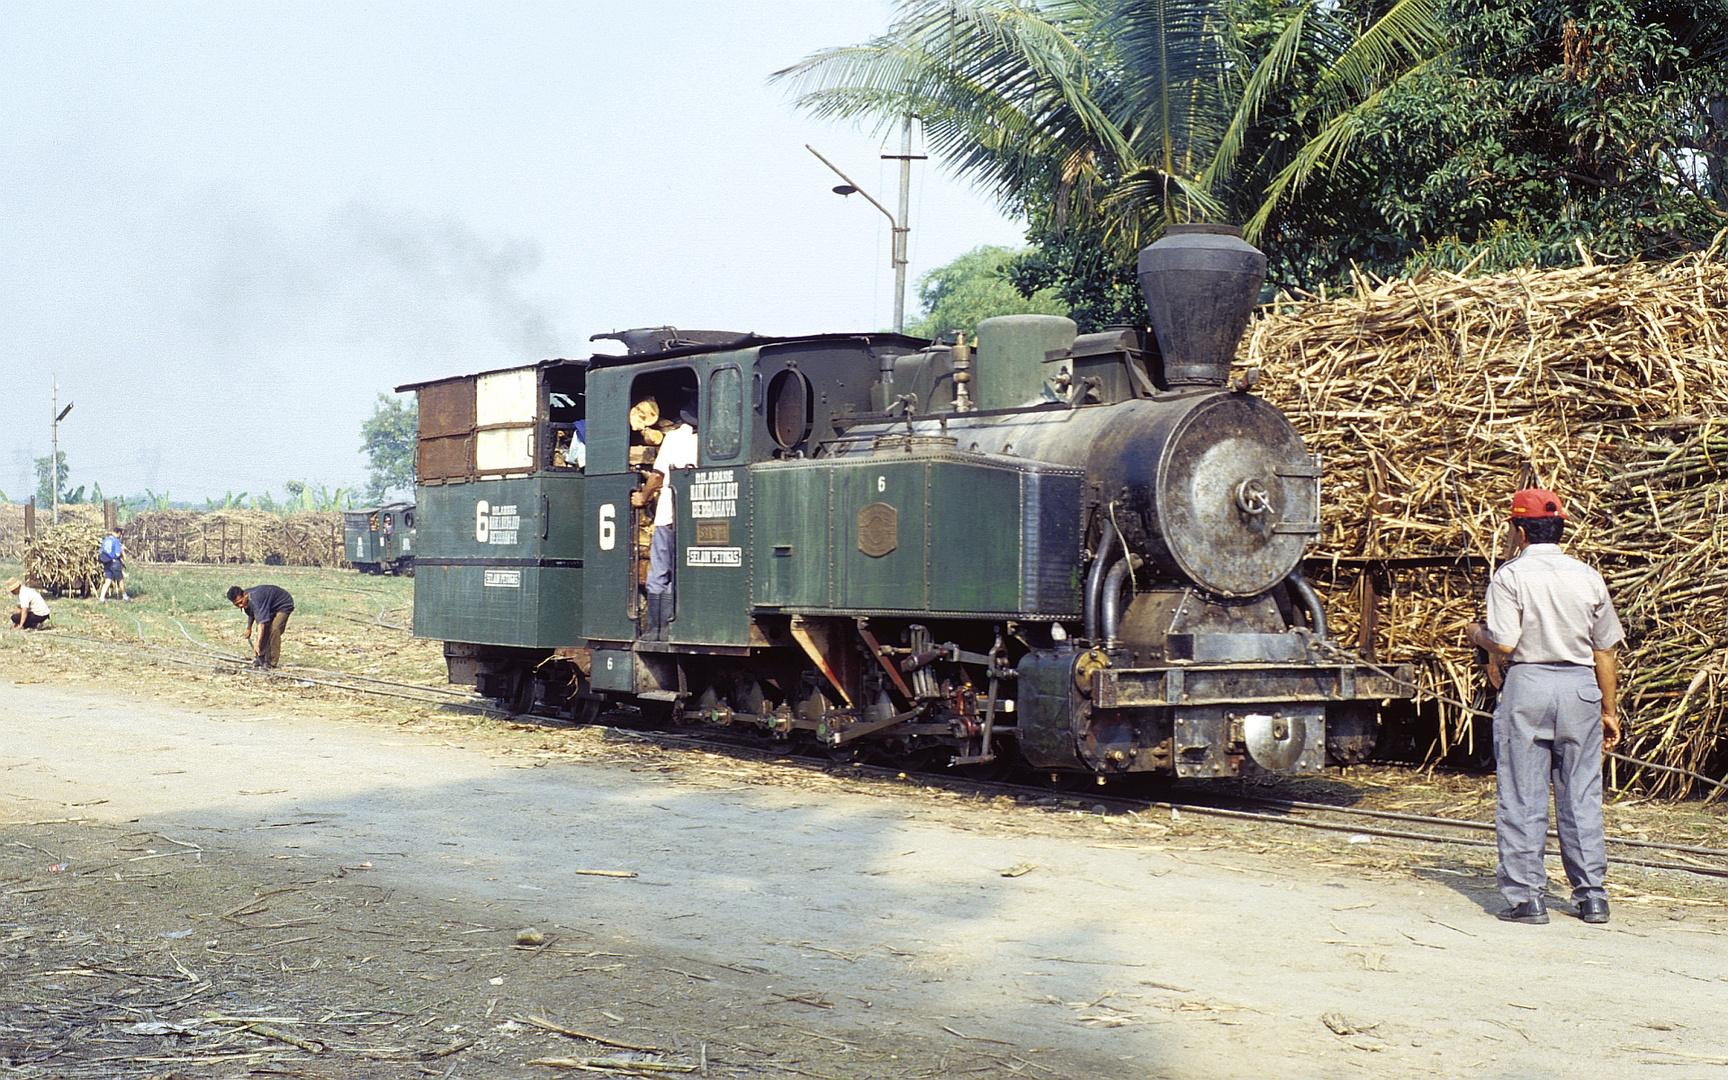 Zuckerfabrik PG Sragi, Pekalongan (Java, Indonesien),Juli 2002